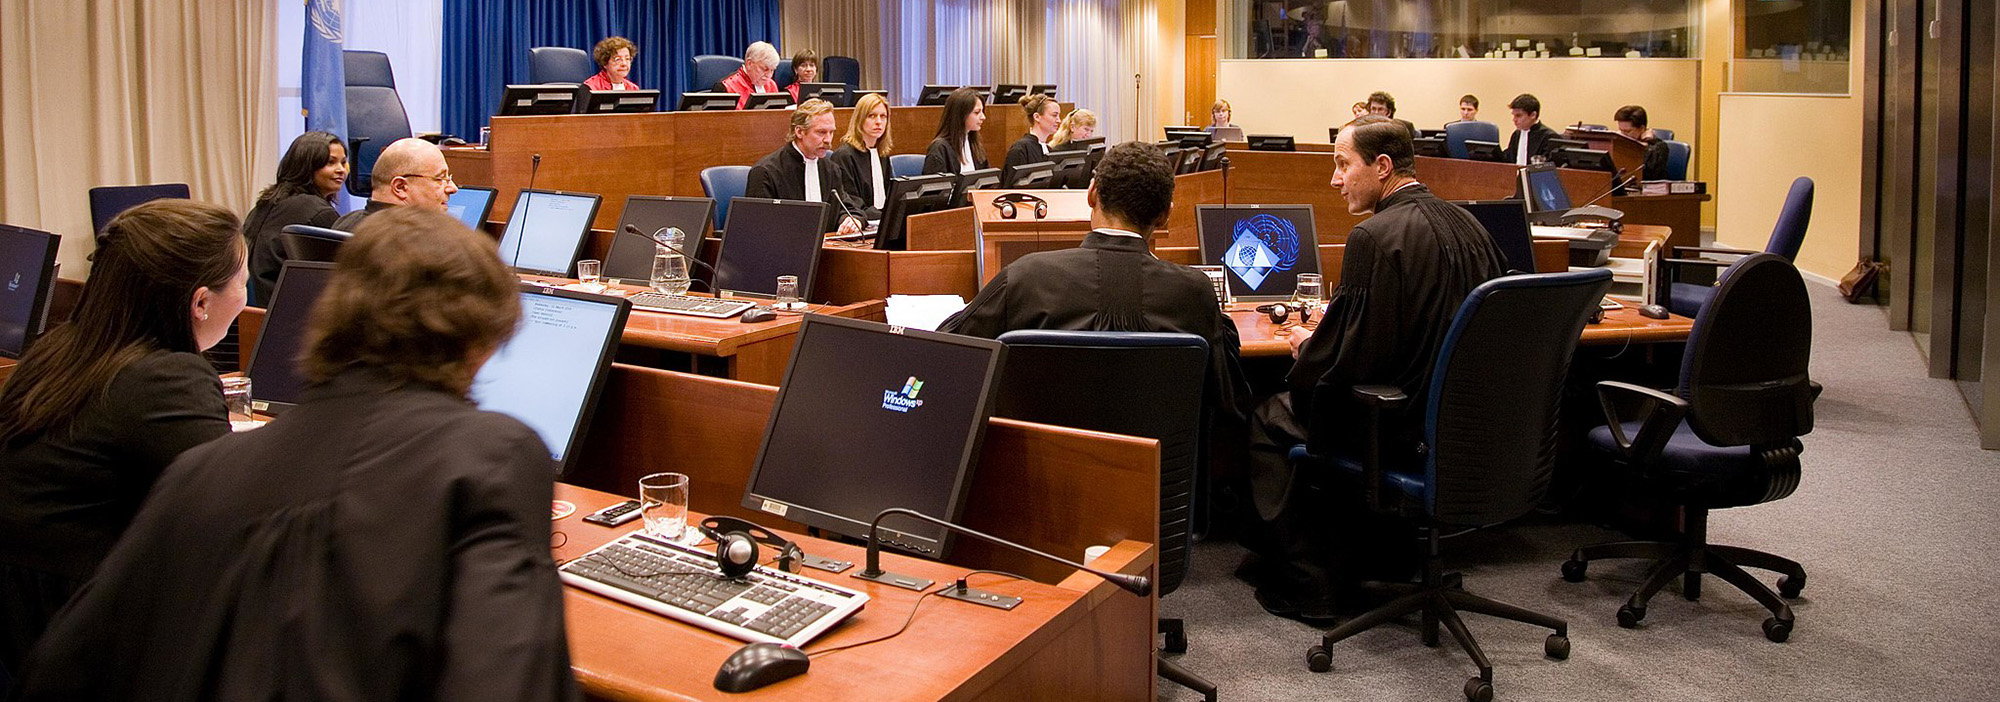 International Criminal Tribunal for the Former Yugoslavia courtroom